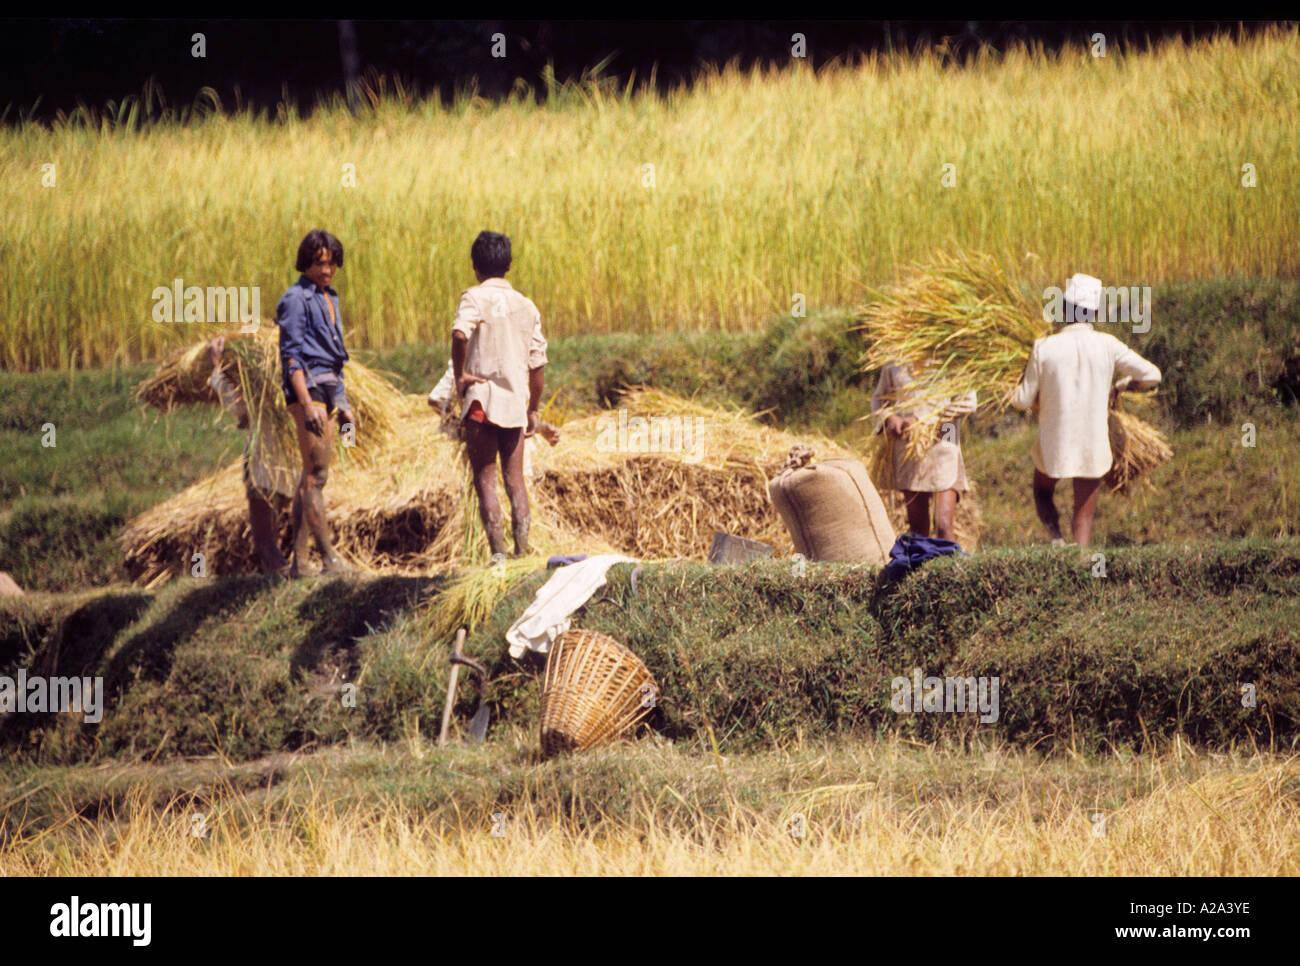 men boy rice field Nepal Asia candid unposed winnowing grain on mat harvest agriculture rural portrait work basket - Stock Image